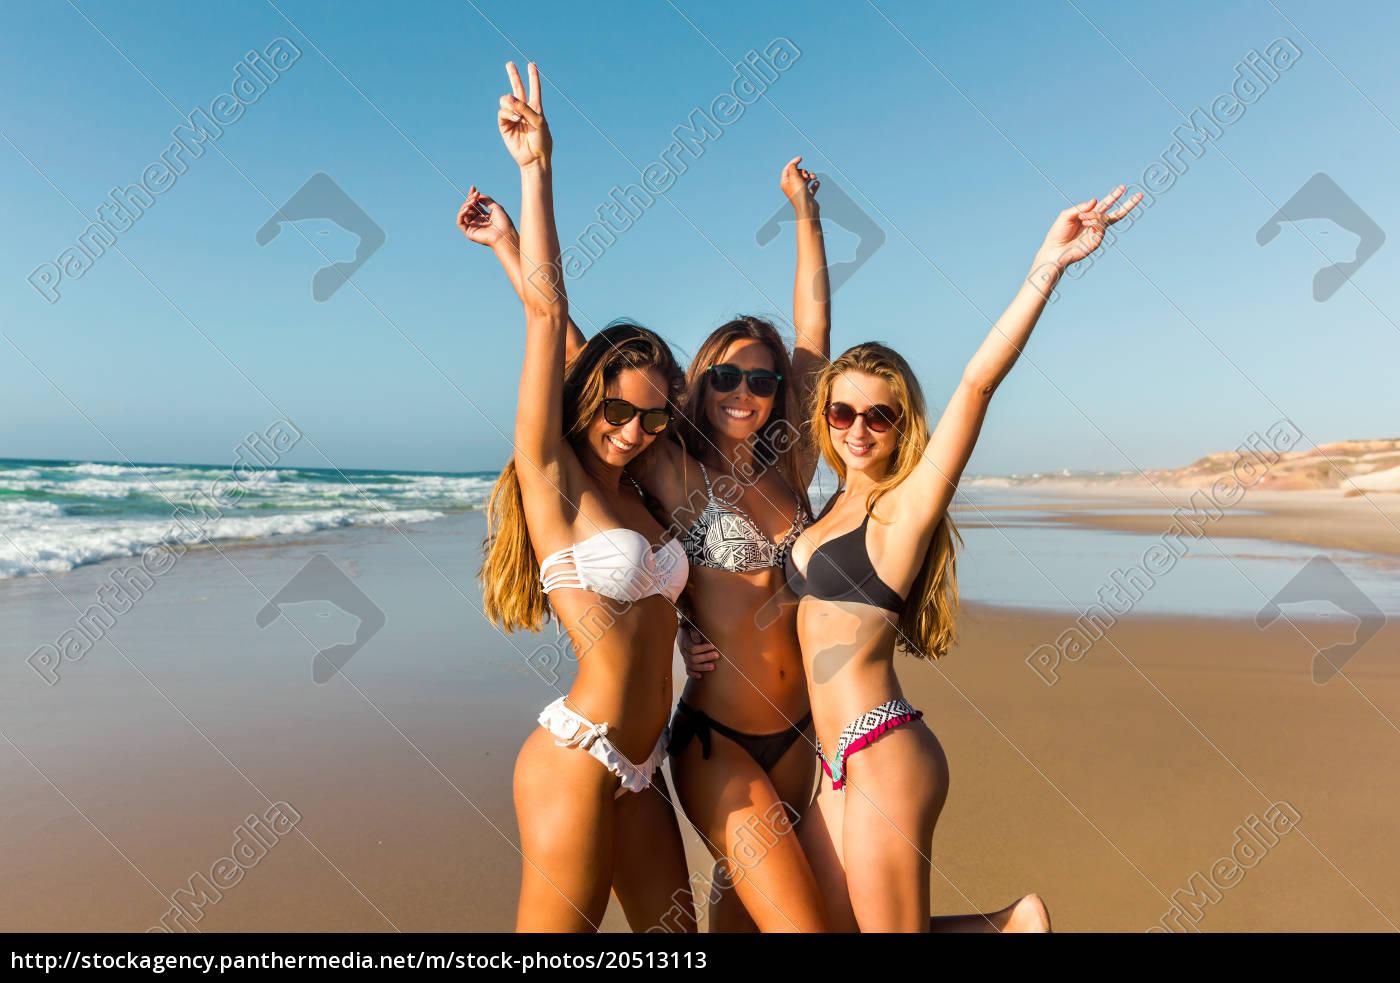 a, day, on, the, beach - 20513113